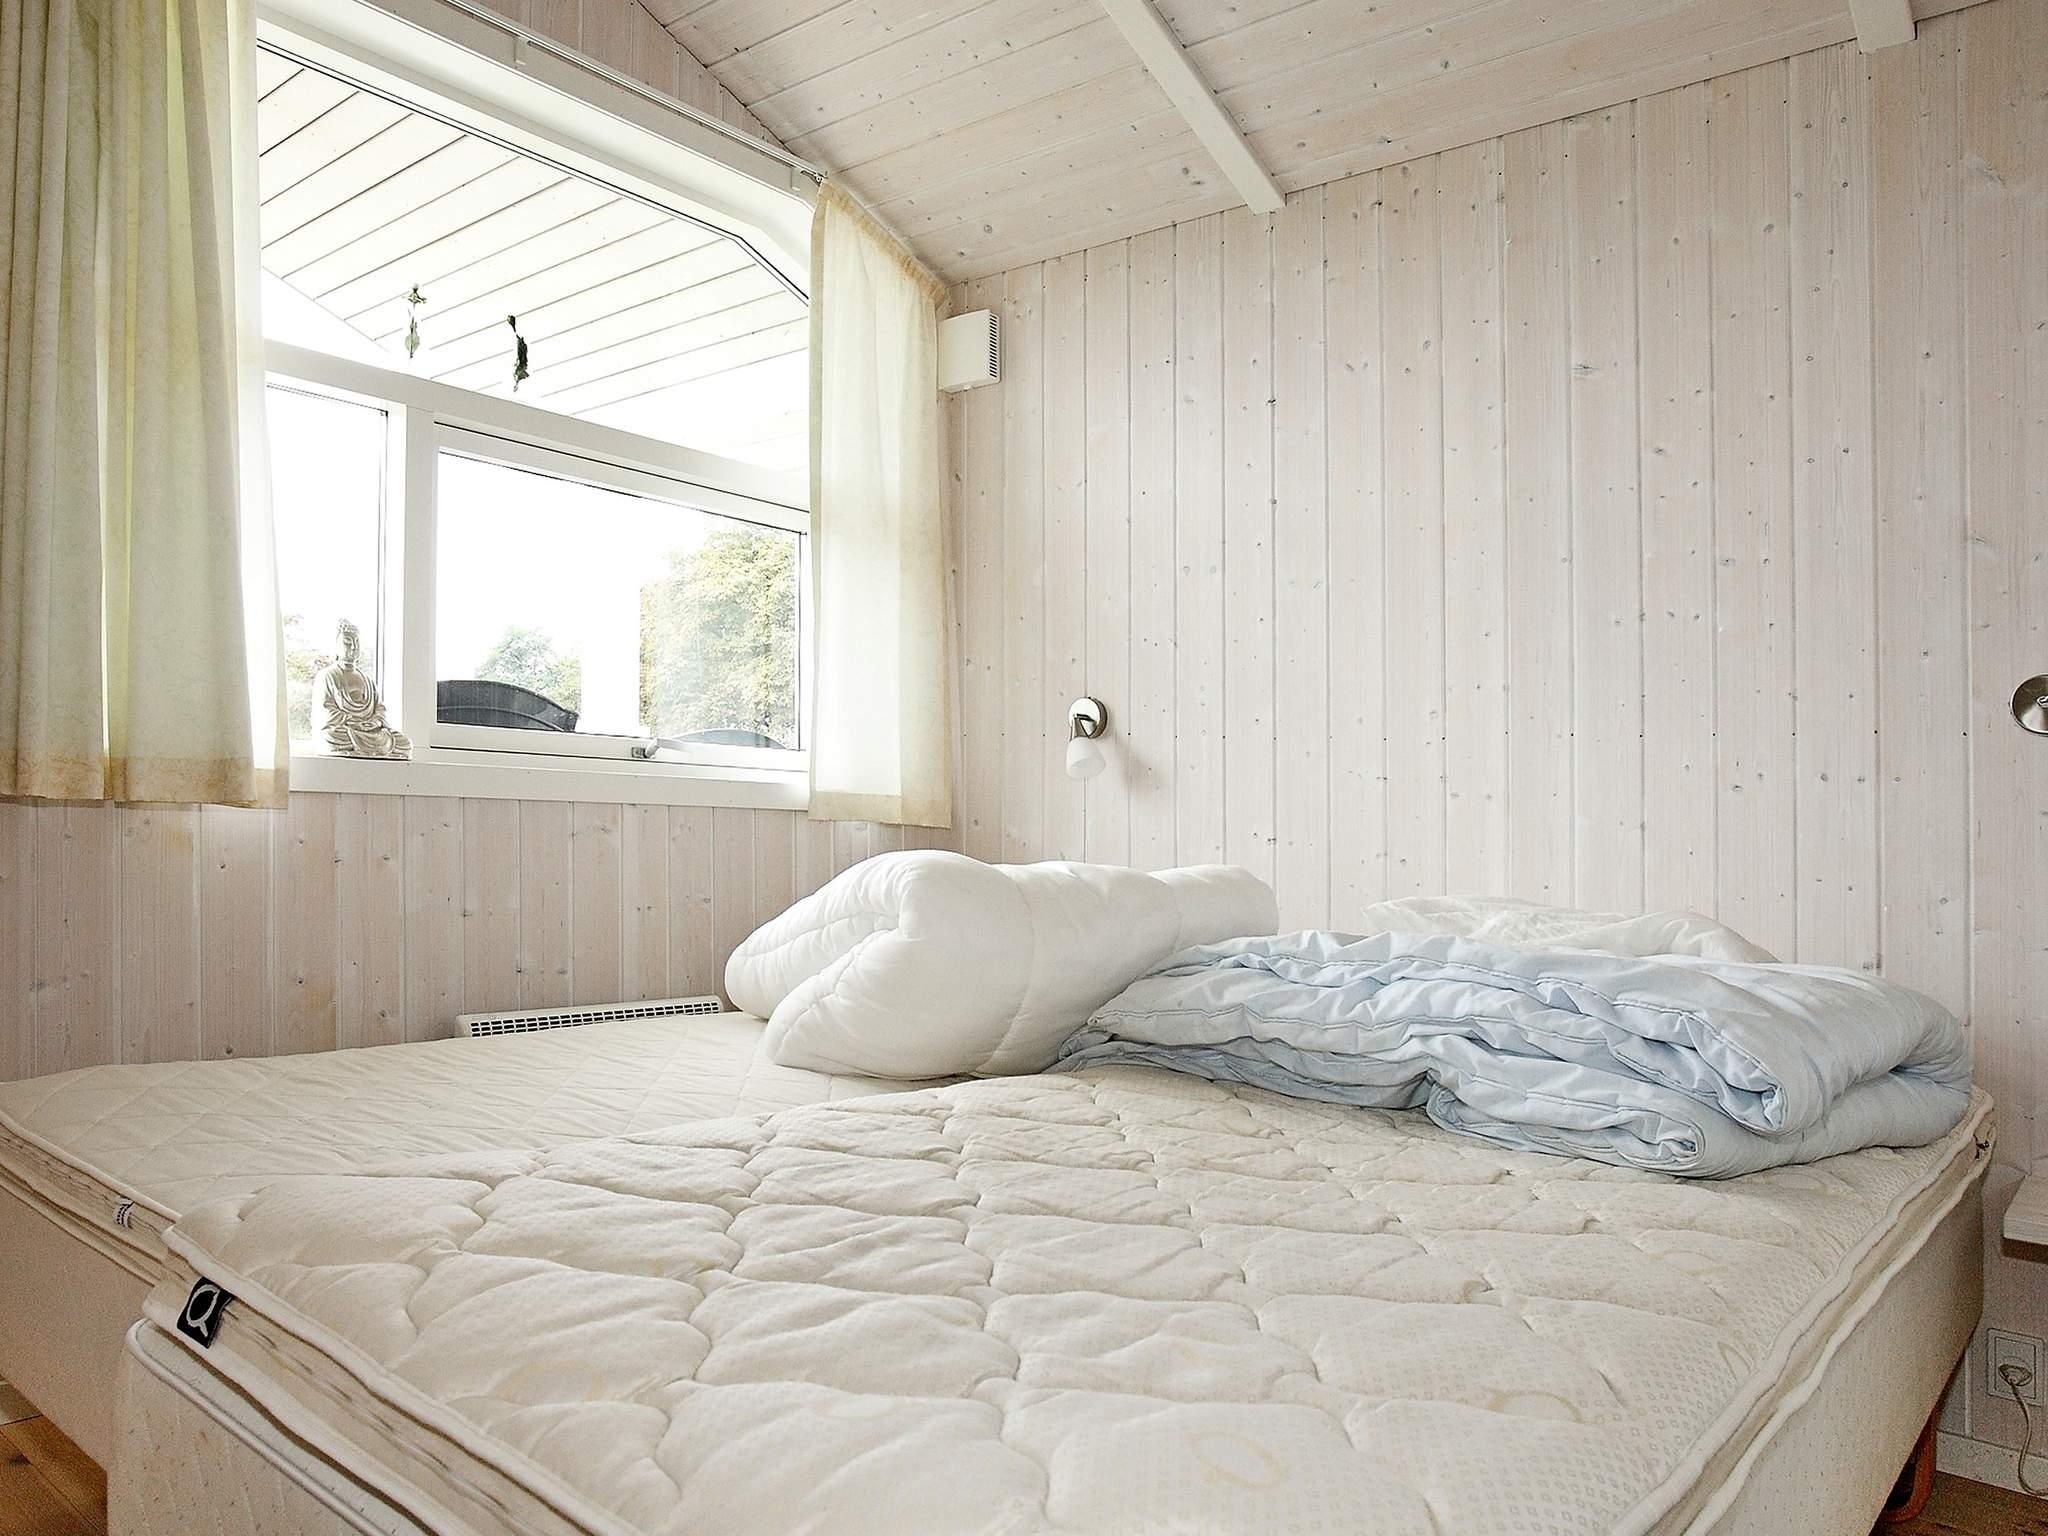 Ferienhaus Øster Hurup (1079907), Øster Hurup, , Ostjütland, Dänemark, Bild 5